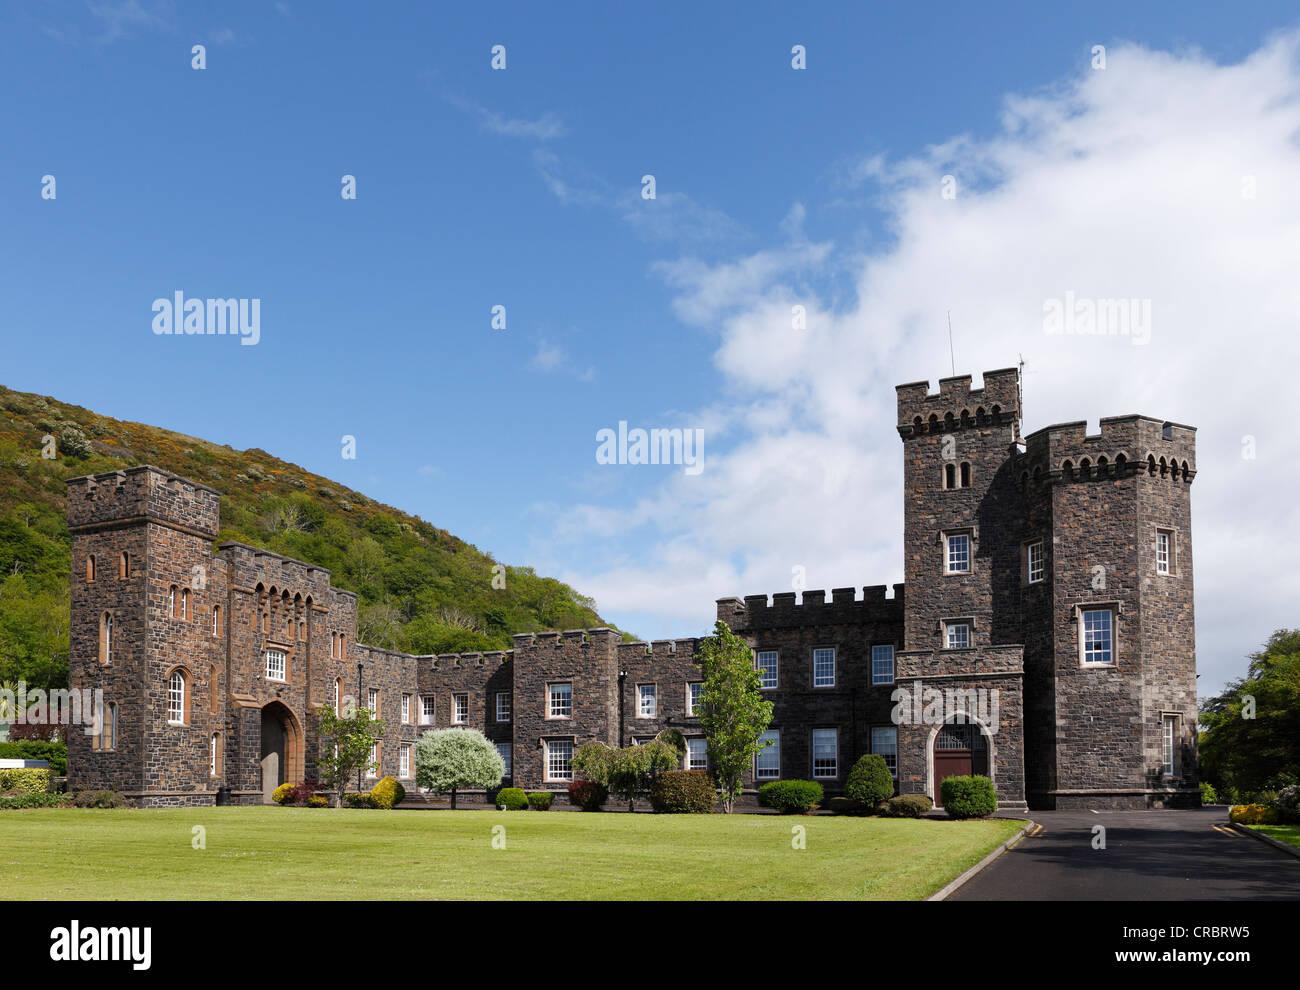 Garron Tower, St Killian's College, Glens of Antrim, County Antrim, Northern Ireland, United Kingdom, Europe - Stock Image